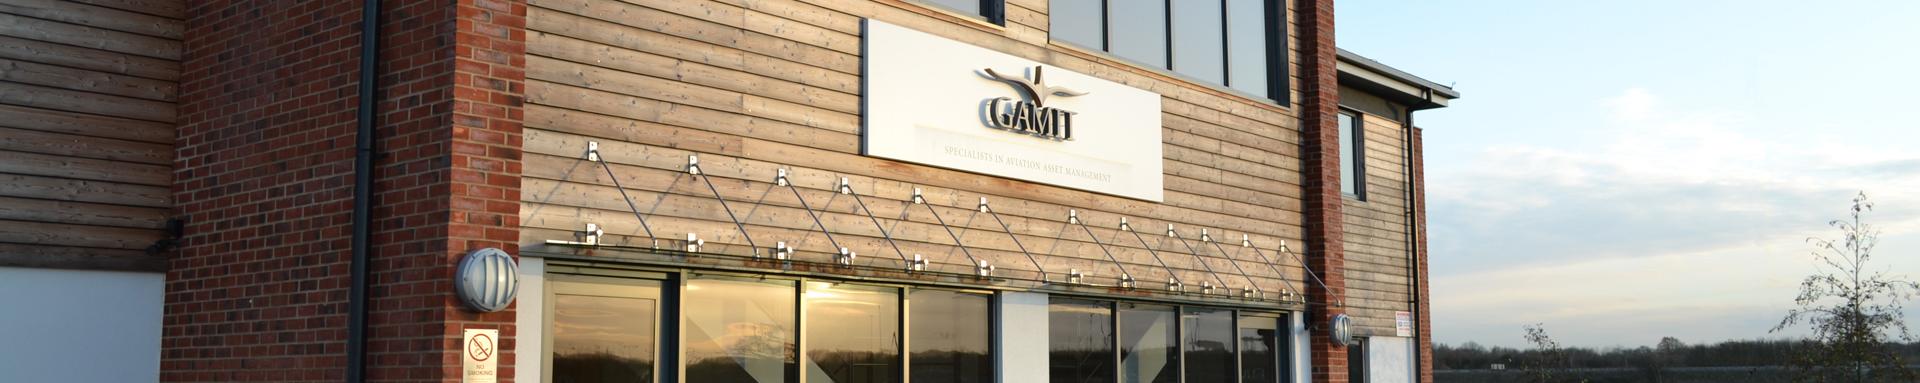 Gamit HQ